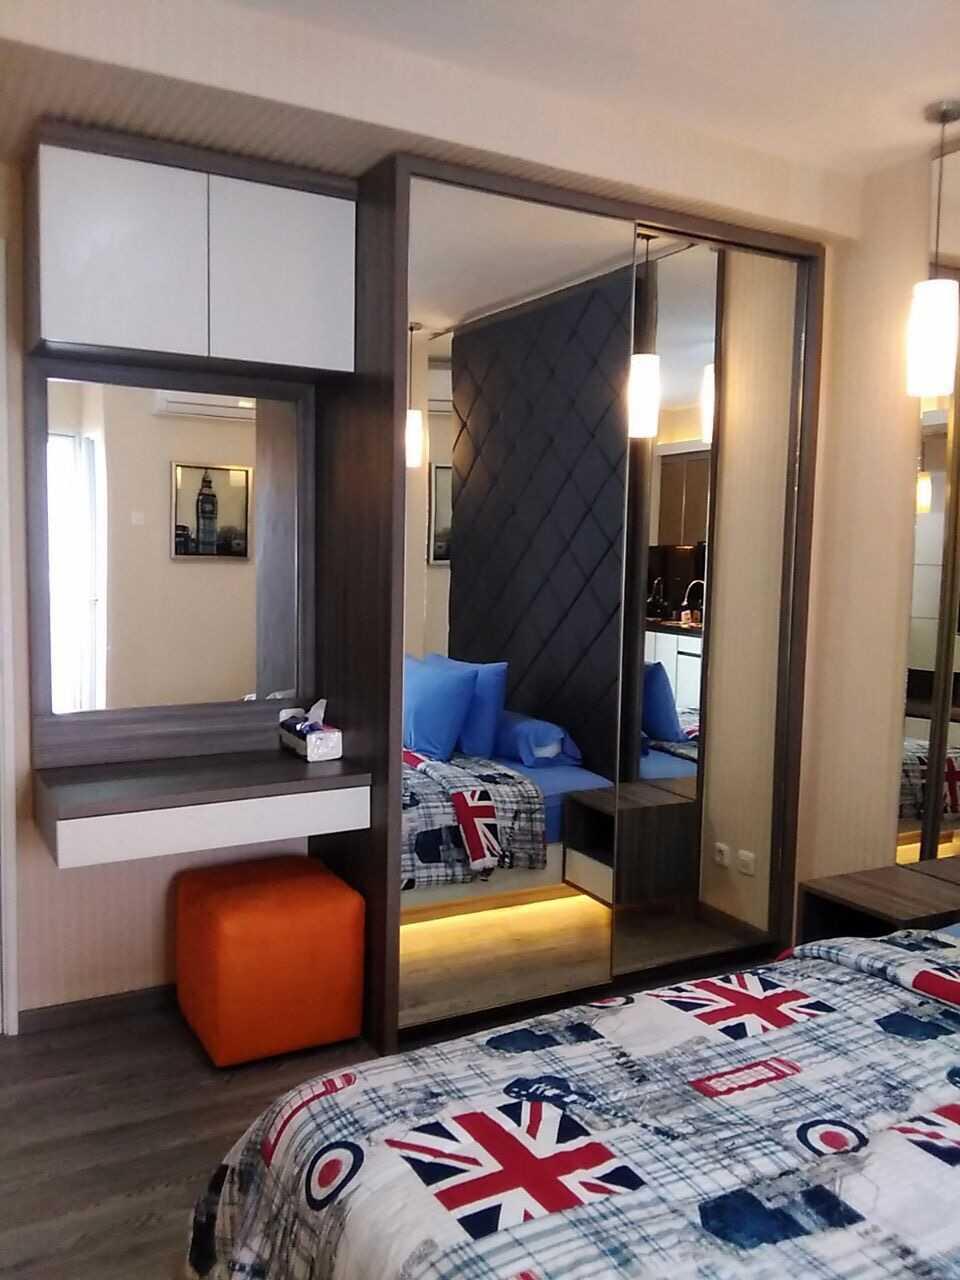 Fiano Modern Apartment Jakarta, Indonesia Jakarta, Indonesia Product-Compact-Wardrobe  31408